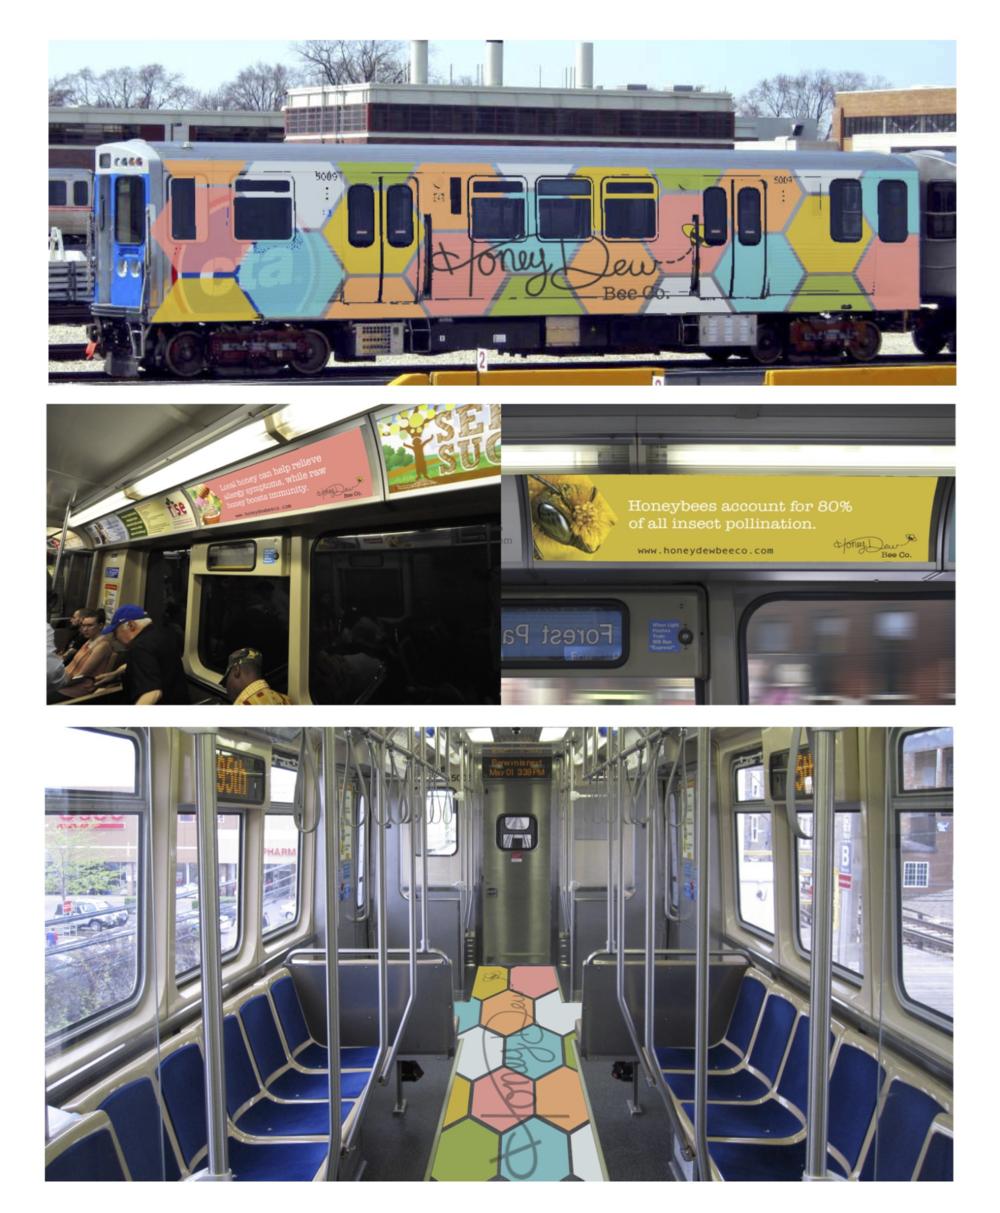 CTA_Advertising_Display.jpg